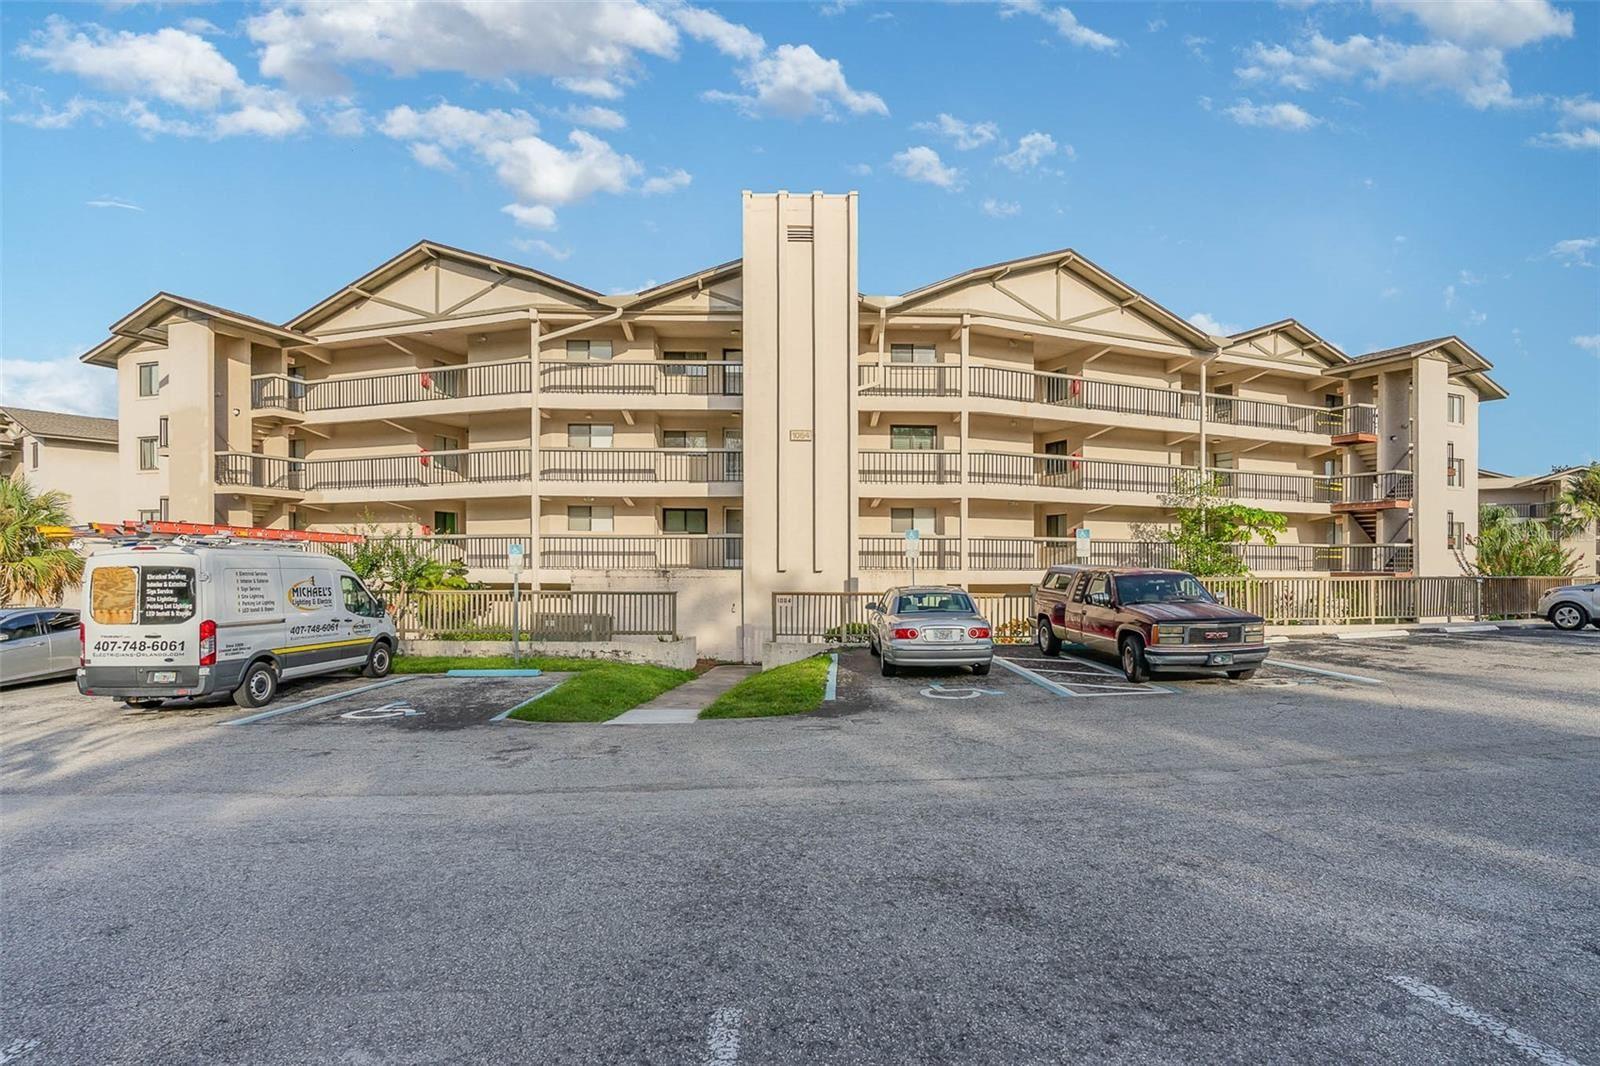 1064 LOTUS PARKWAY #932, Altamonte Springs, FL 32714 - #: O5970073